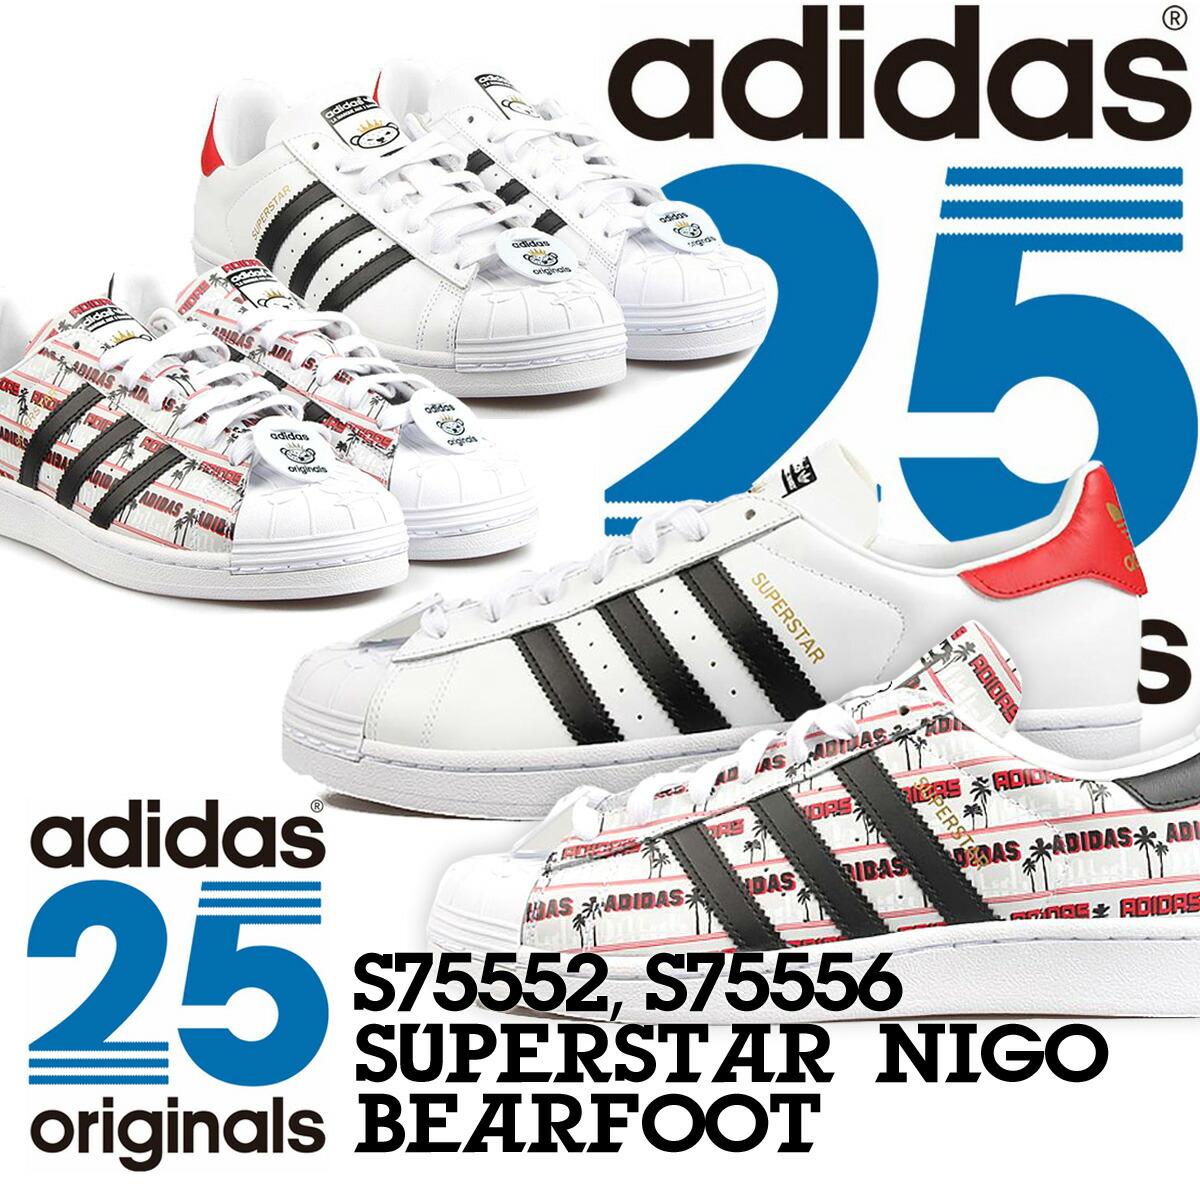 Sugar Online Shop   Rakuten Global Market: adidas NIGO adidas originals superstar Niger barefoot sneakers SUPERSTAR NIGO BEARFOOT S75552 S75556 men women